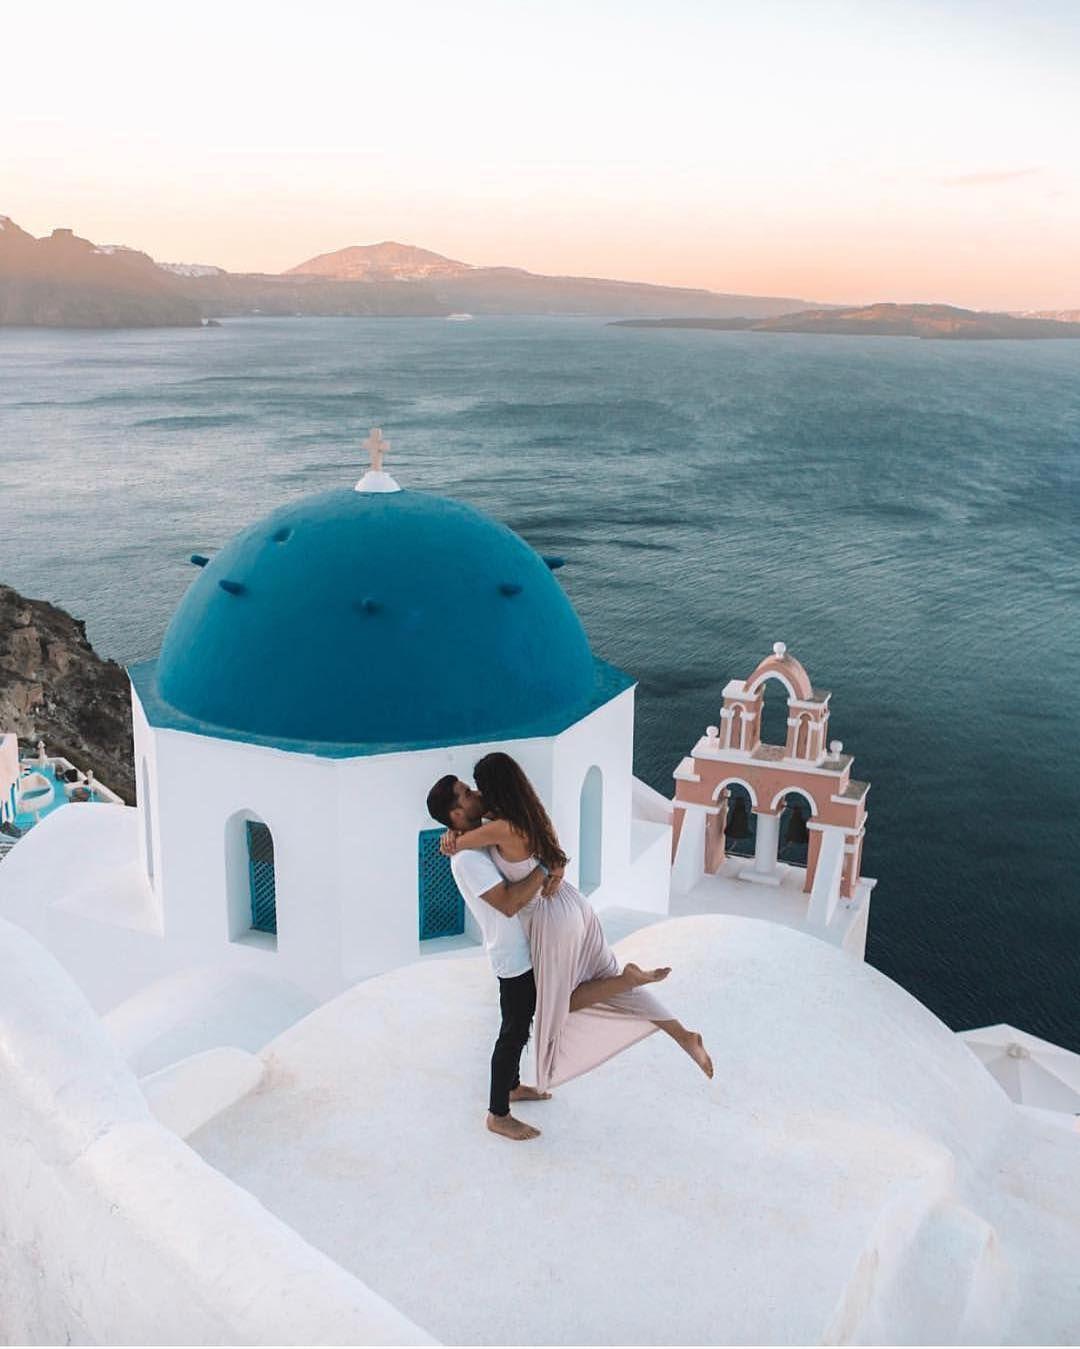 ", Cyber Fashion Inspiration on Instagram: ""Tag your bae ? … Follow: @cyberfashioninspiration  By: @explorerssaurus_  Via: @fashiongoalsz"", Travel Couple, Travel Couple"